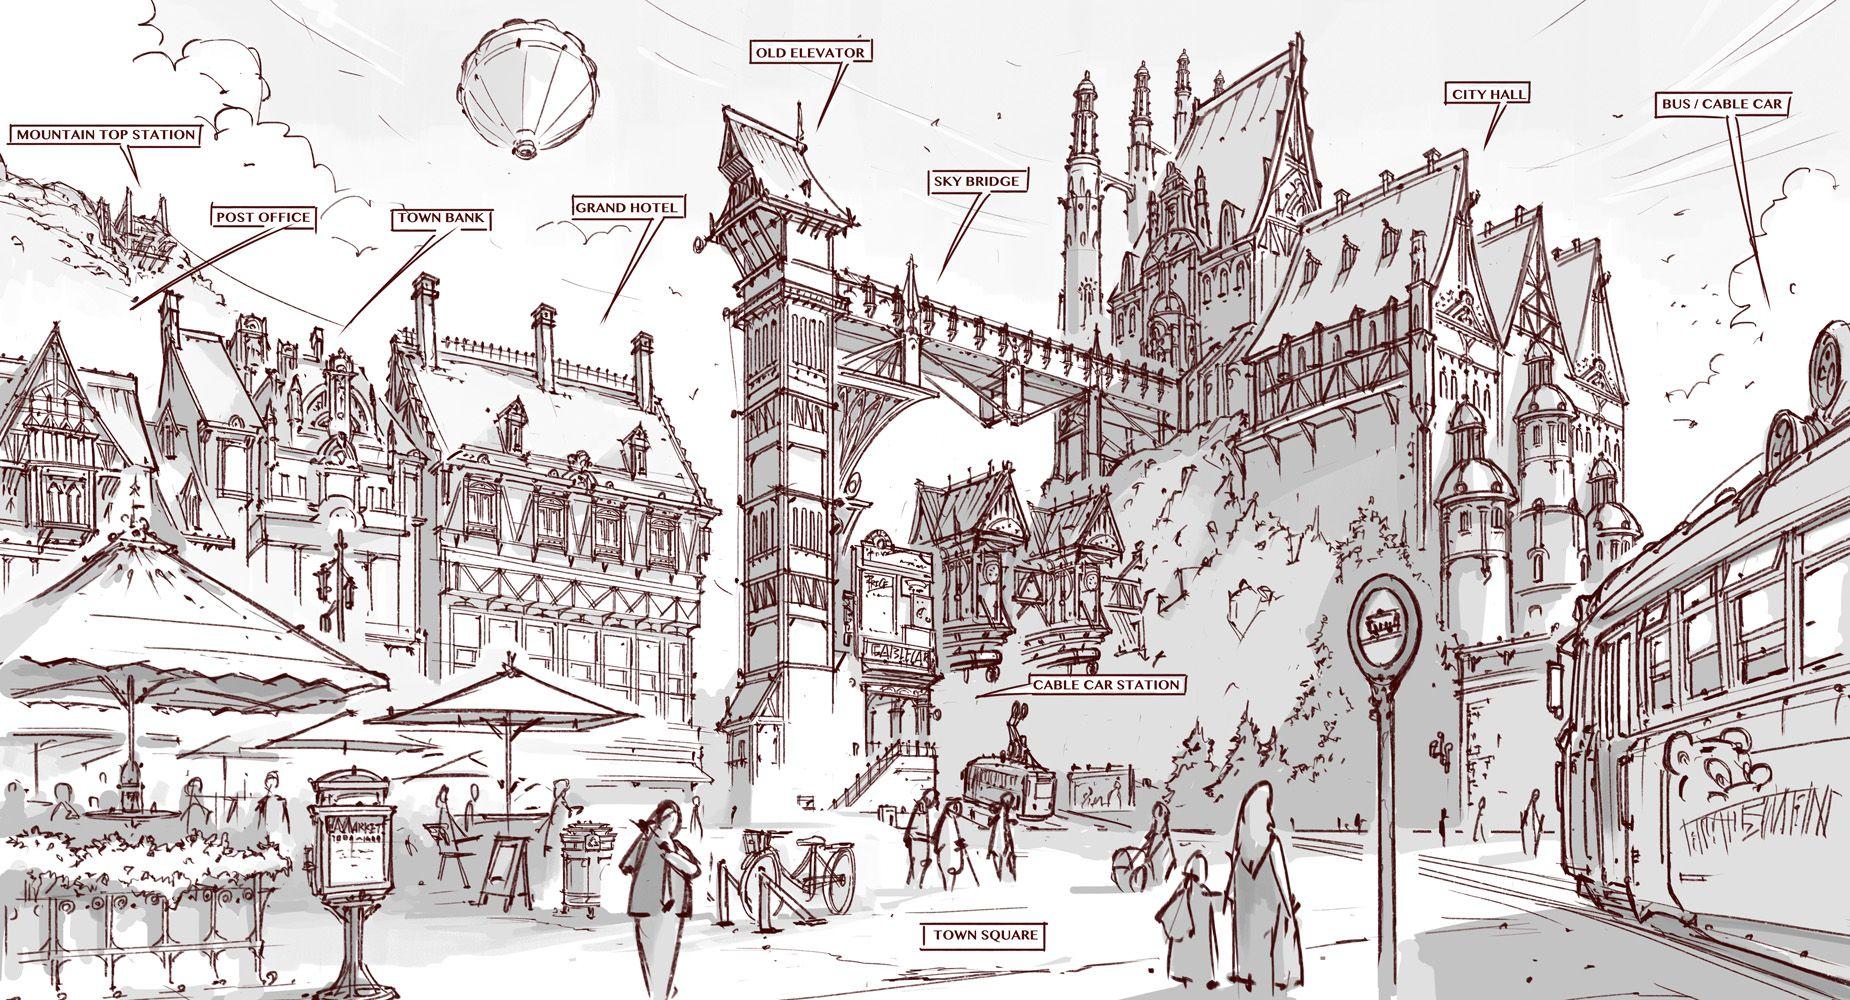 Town Design City Hall And Cable Car Station By Alantsuei Deviantart Com On Deviantart City Design Car Station Environment Concept Art